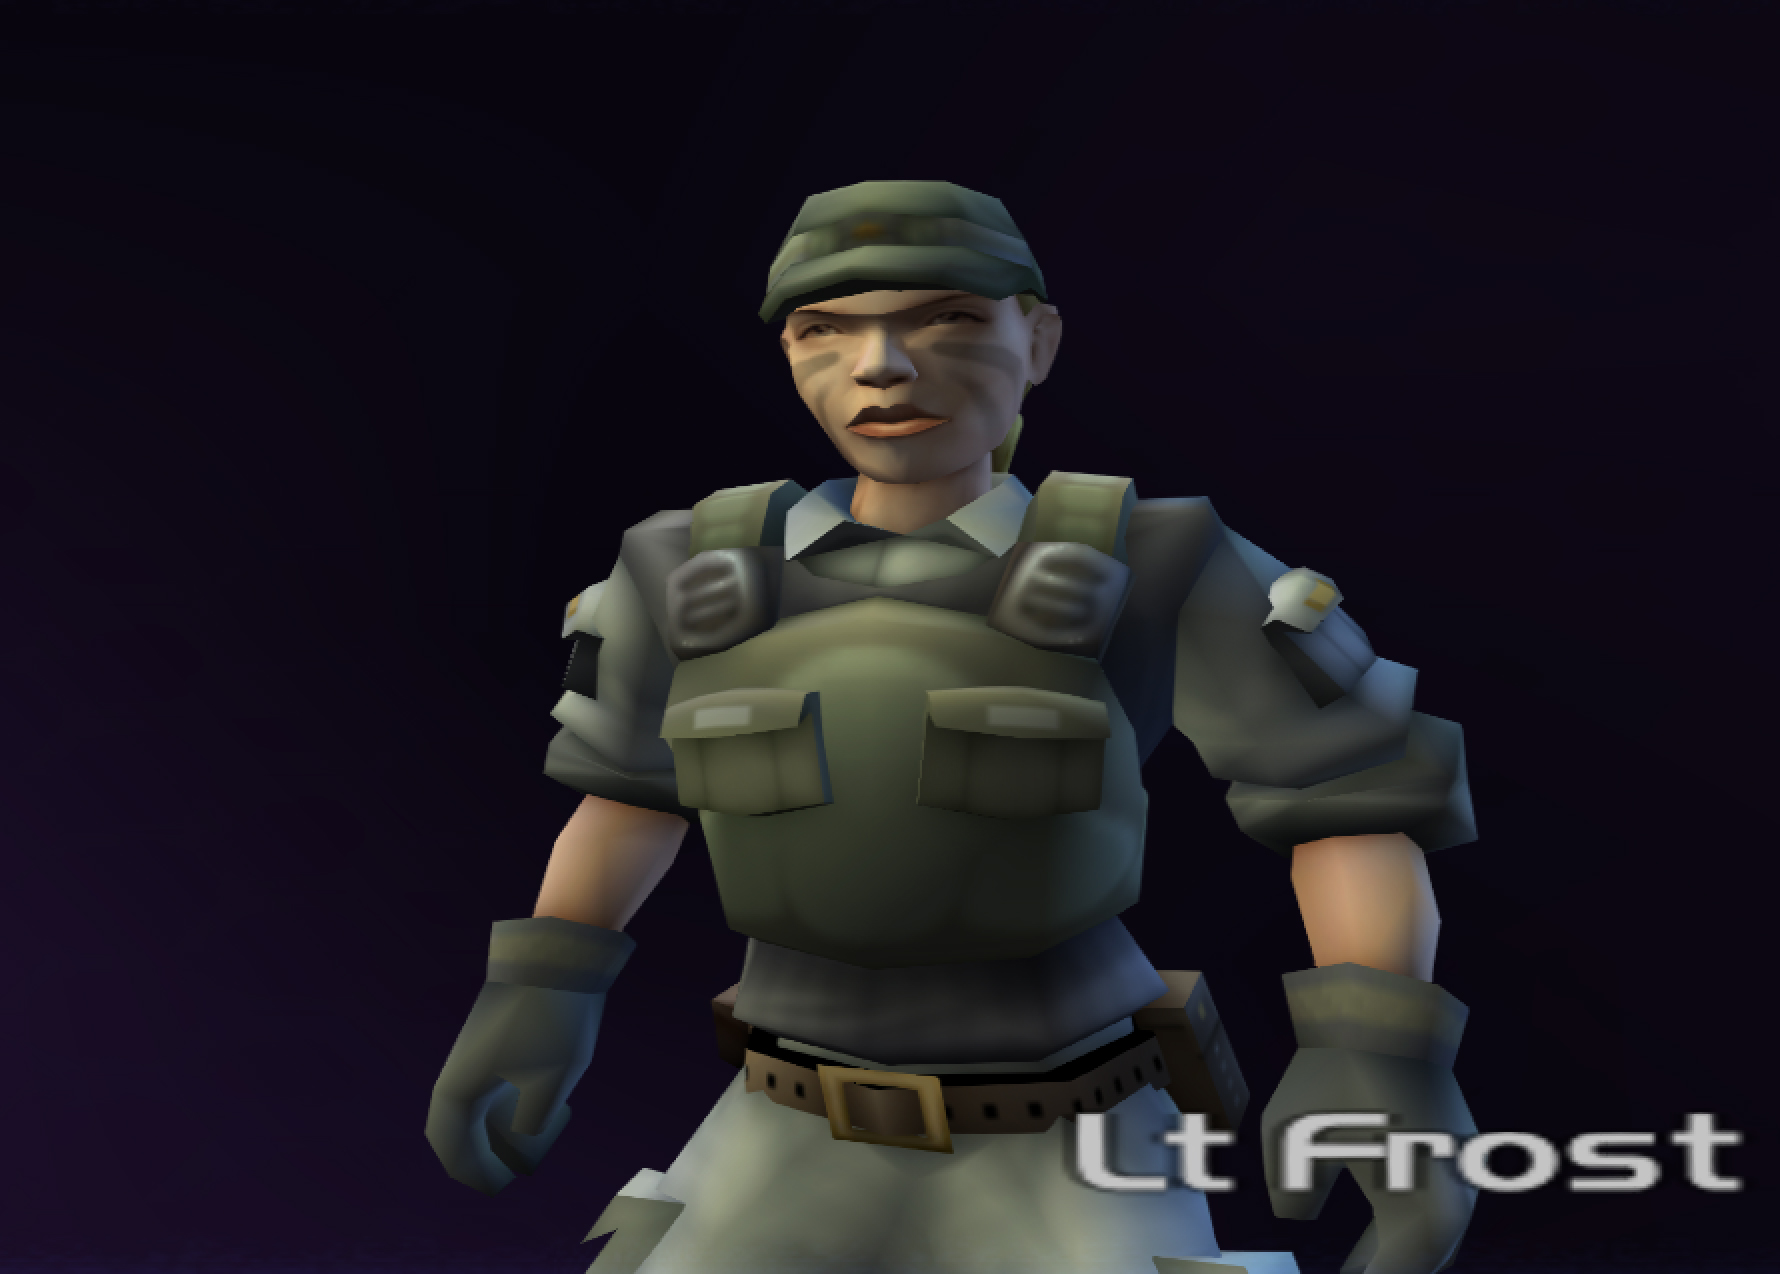 Lieutenant Frost